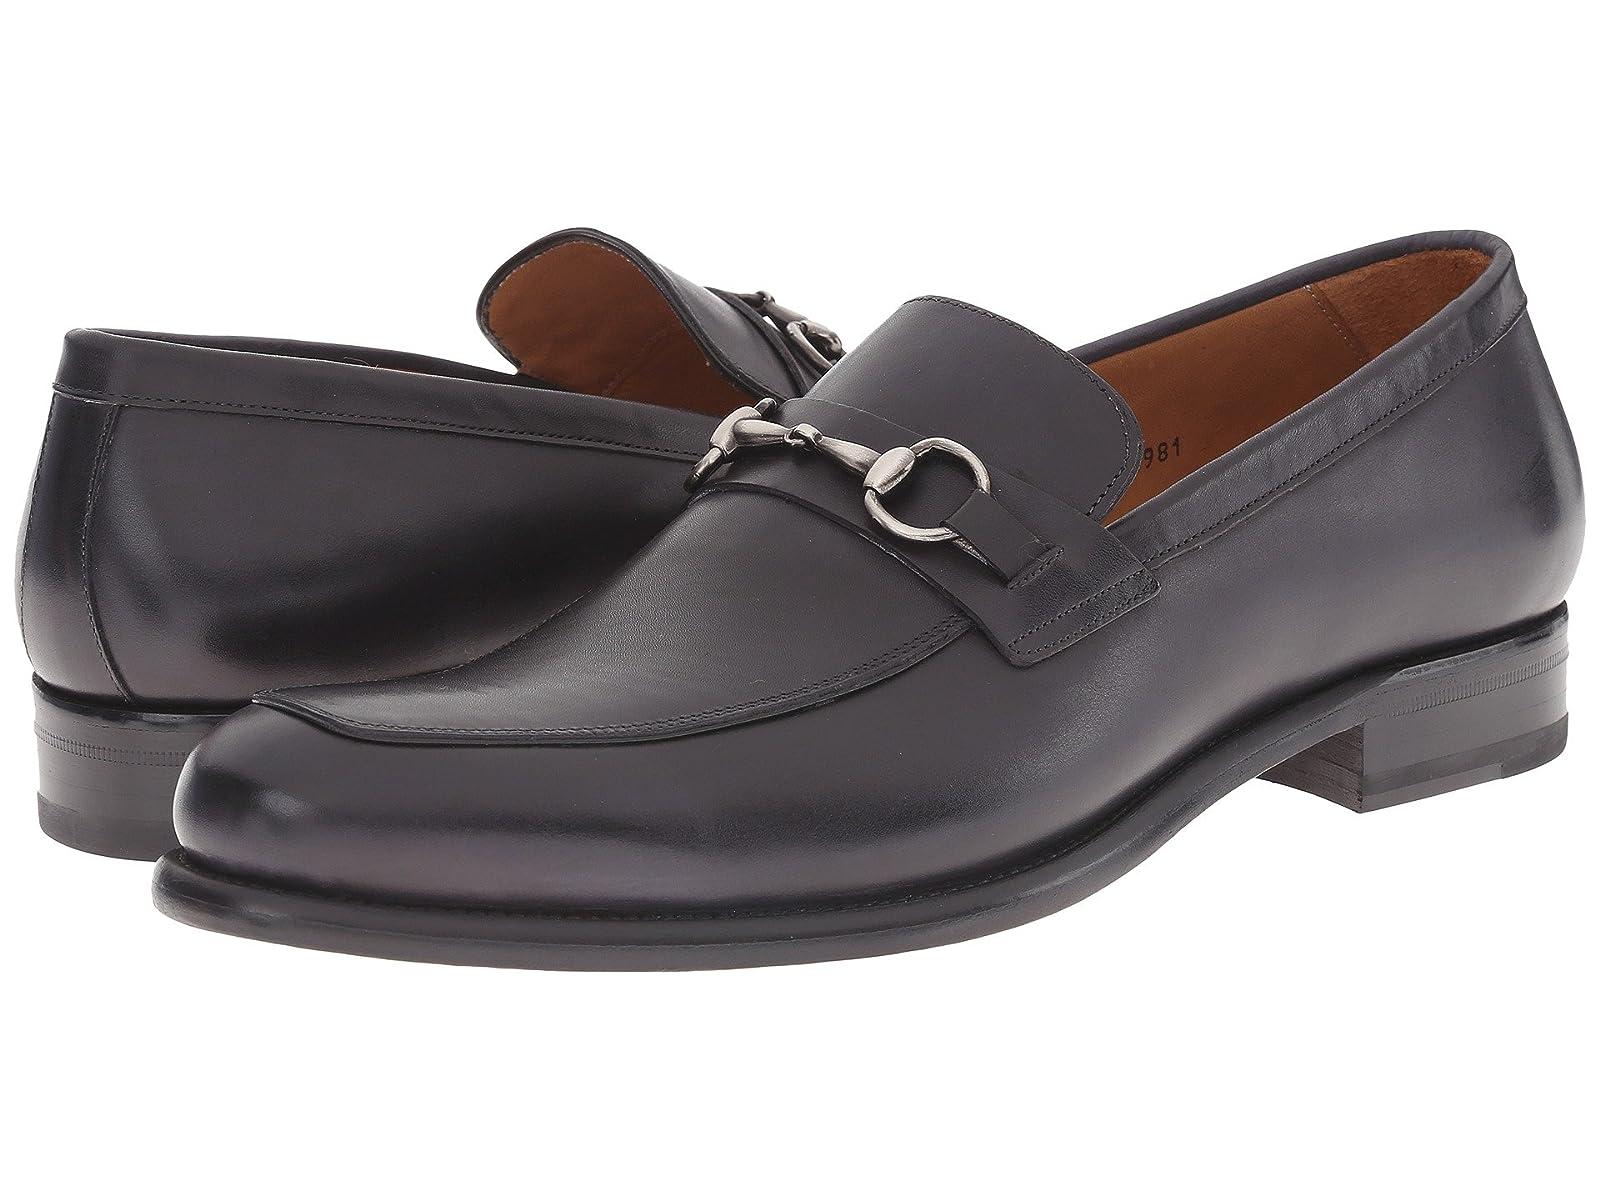 Mezlan WorcesterAtmospheric grades have affordable shoes